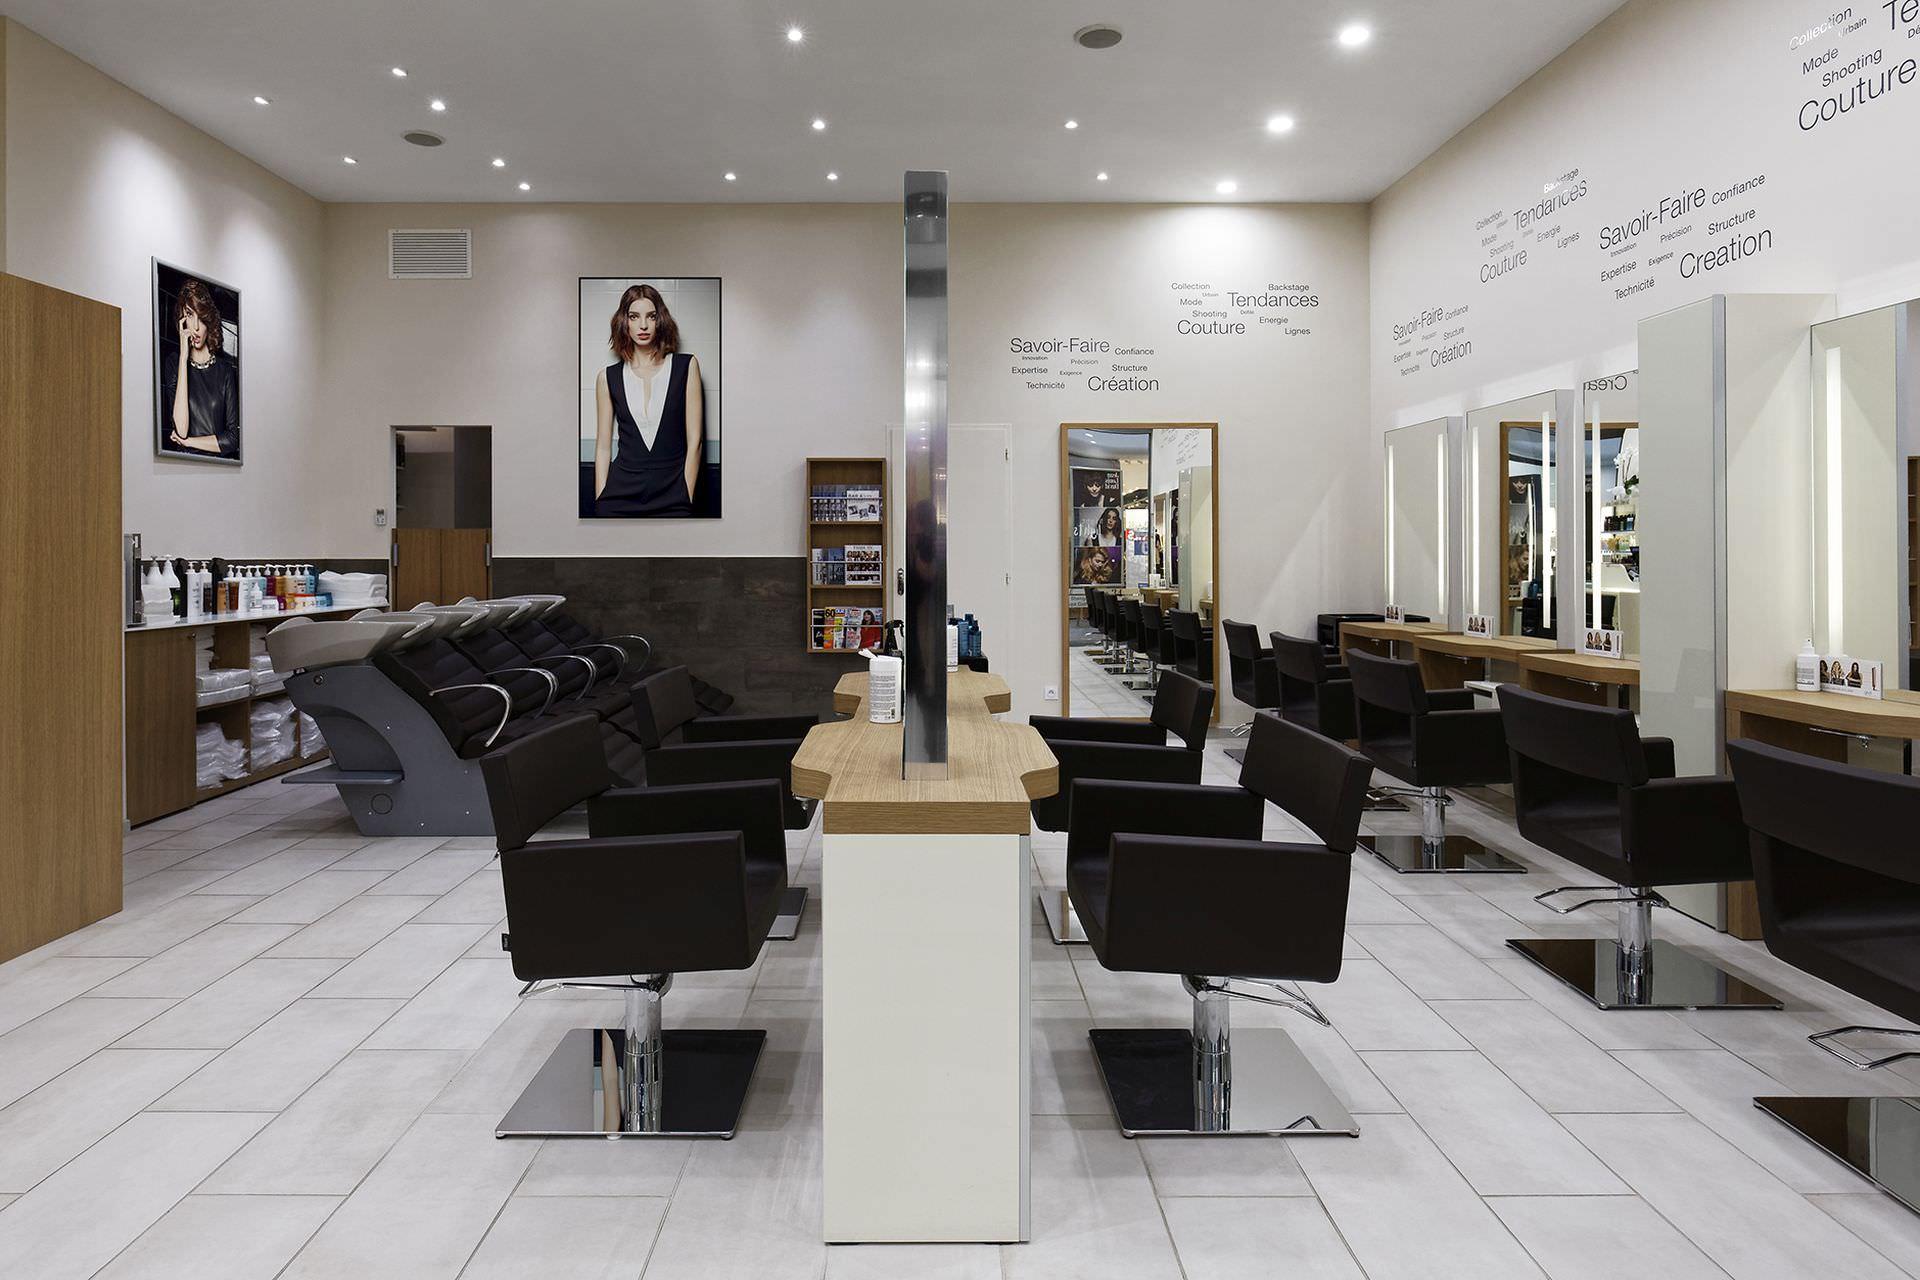 renovation-salon-coiffure-jean-louis-david-004